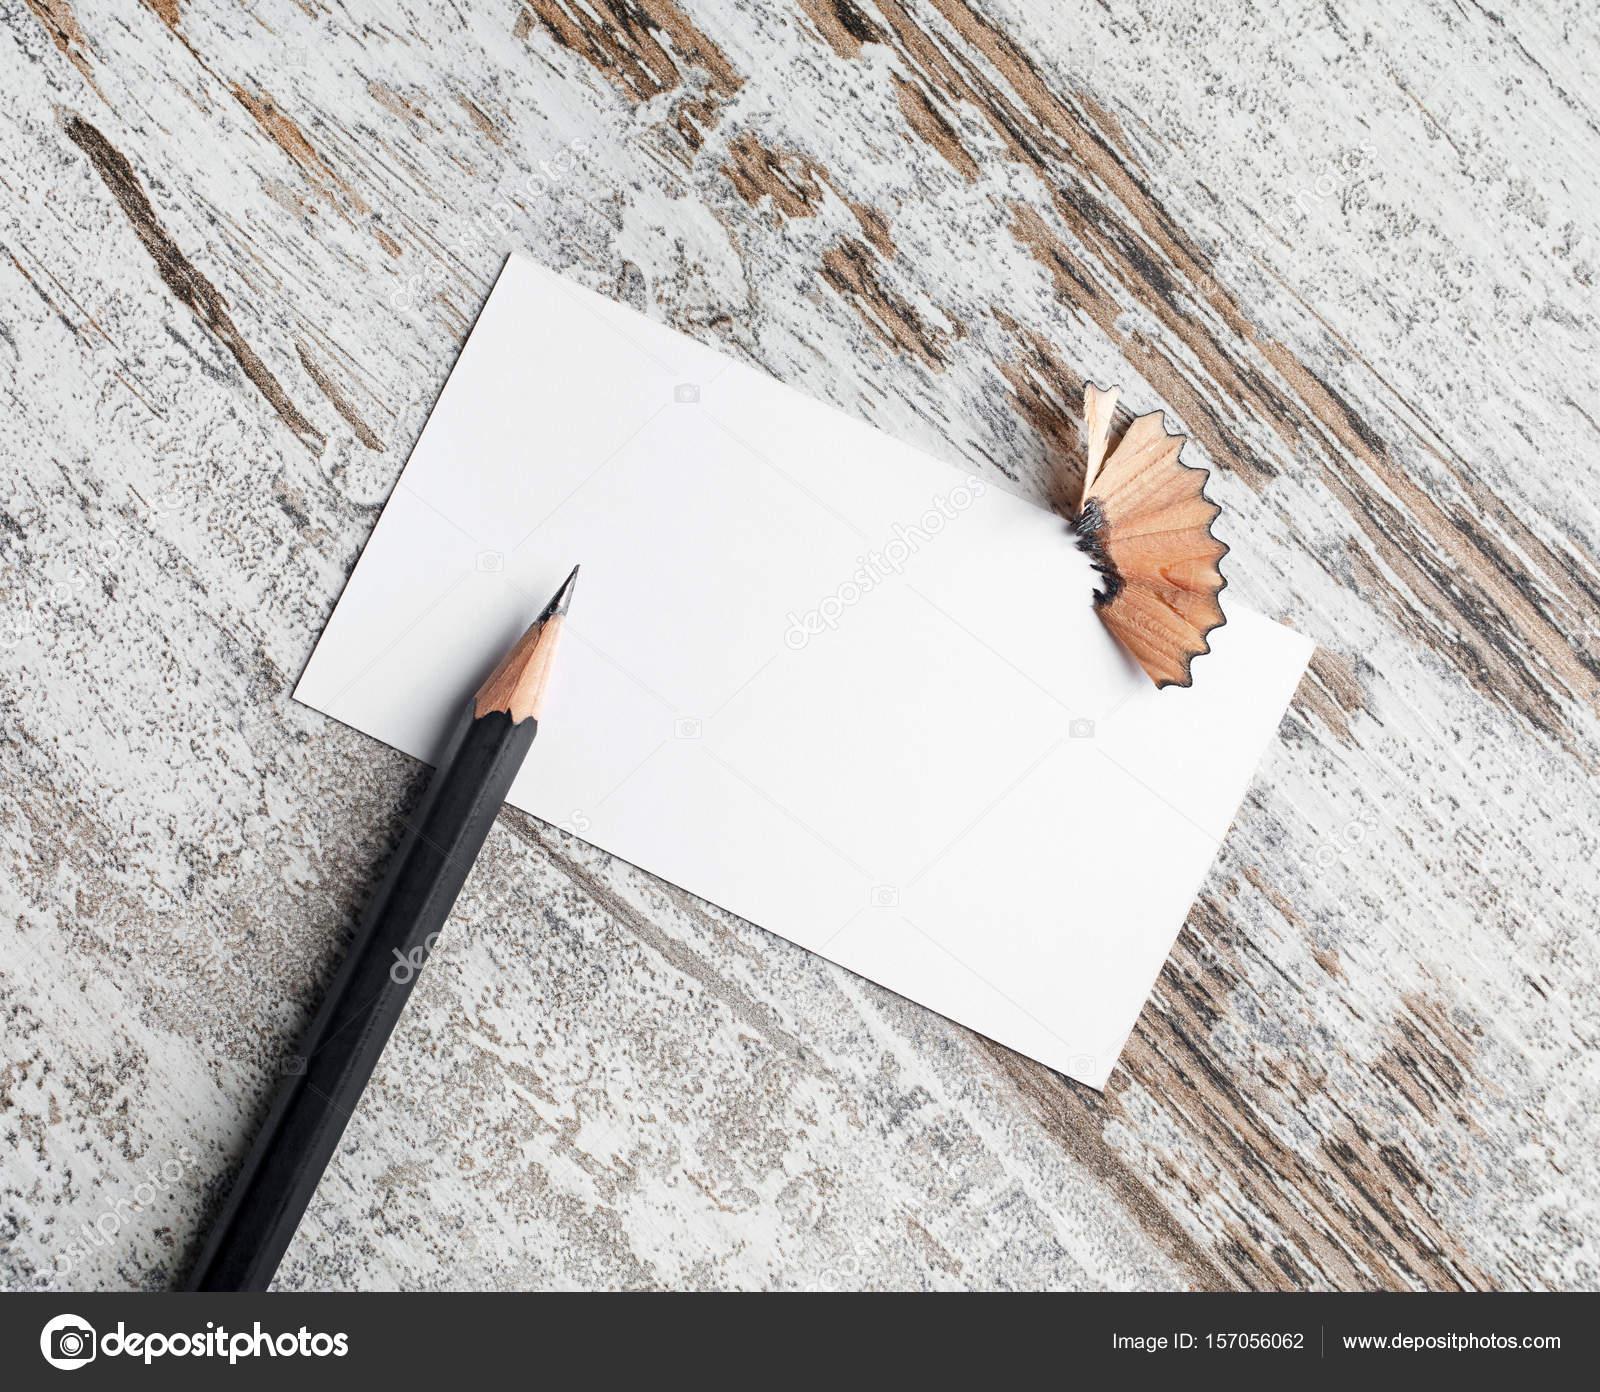 Tarjetas y lápiz — Foto de stock © Veresovich #157056062